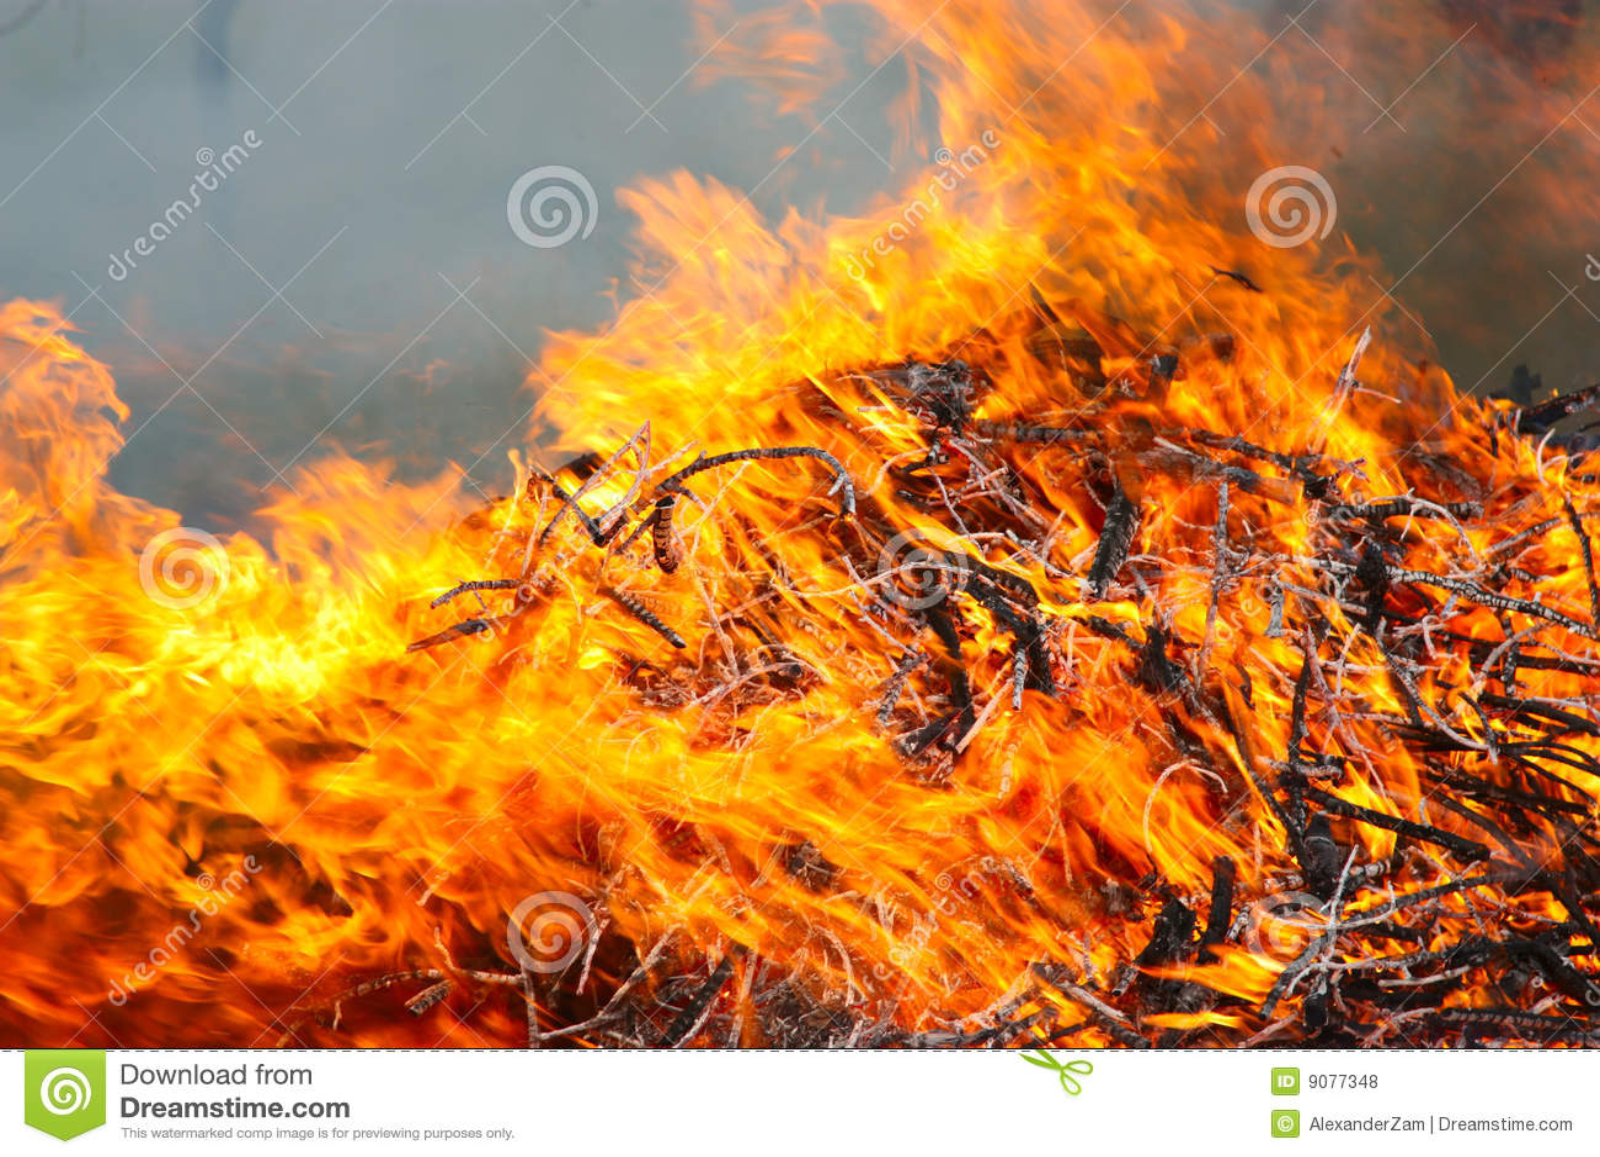 Feuersbrunst